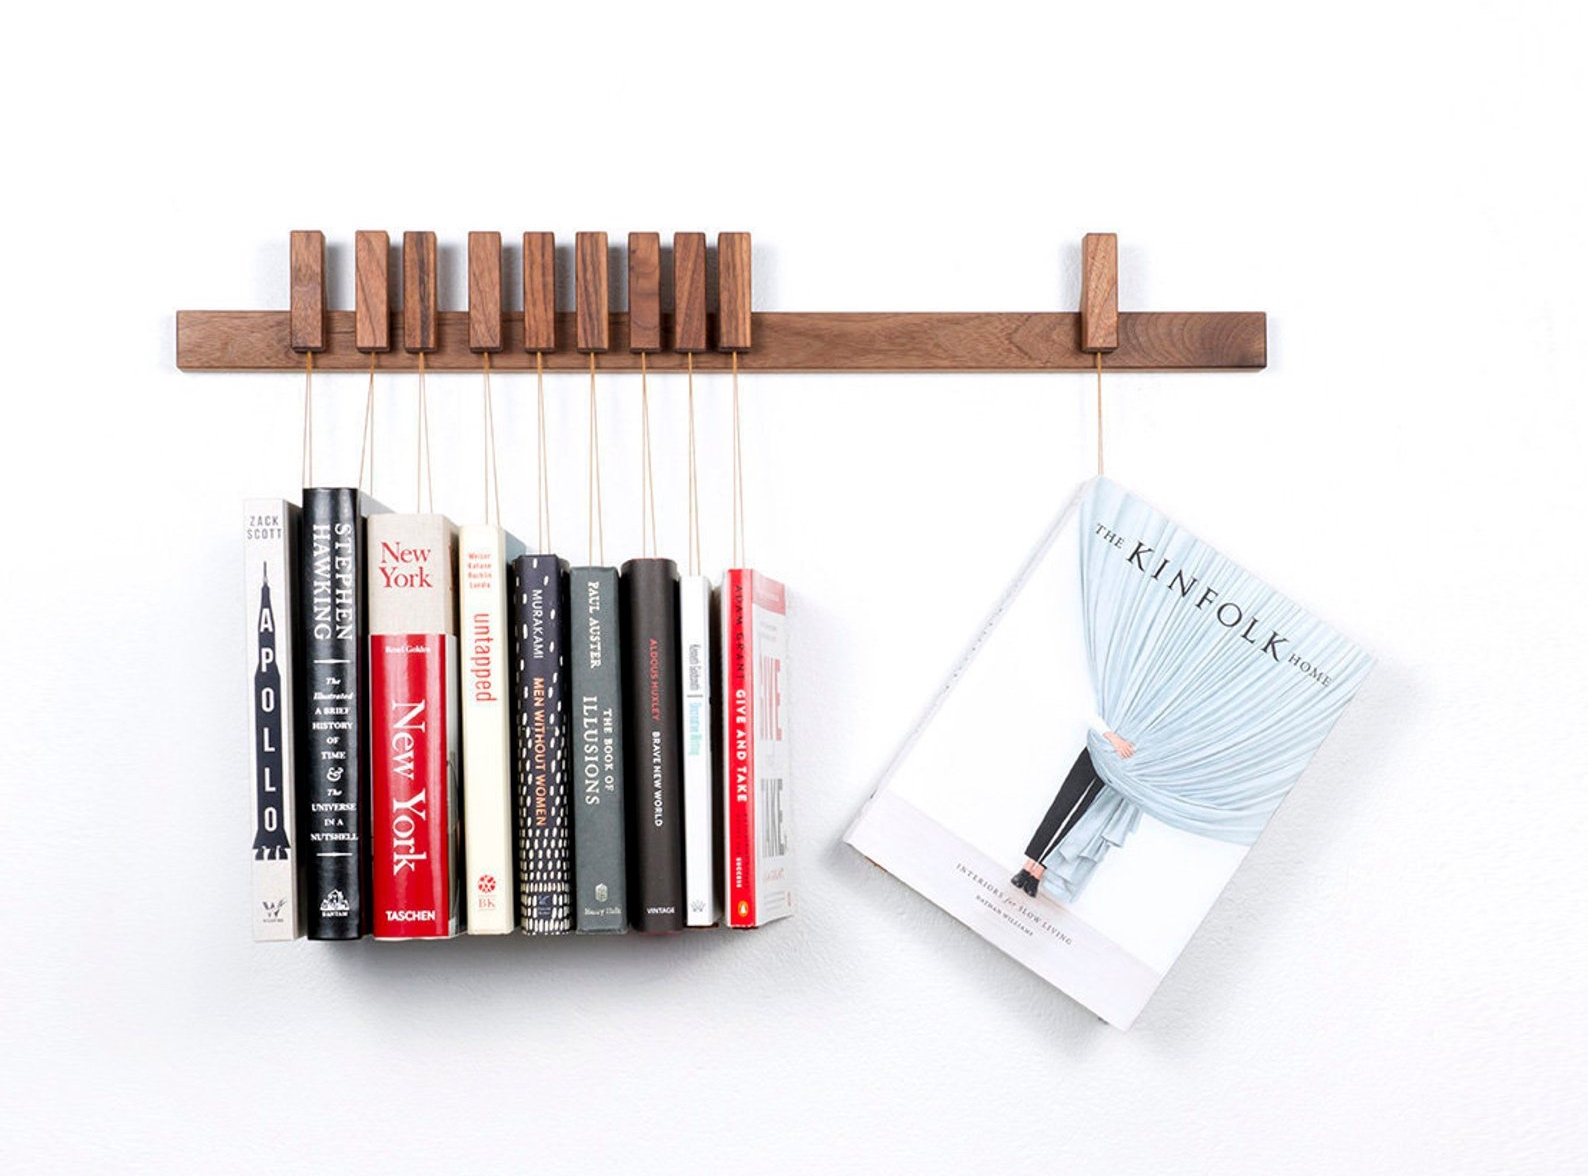 Custom Made Wooden Book Rack By Agustav Furniture